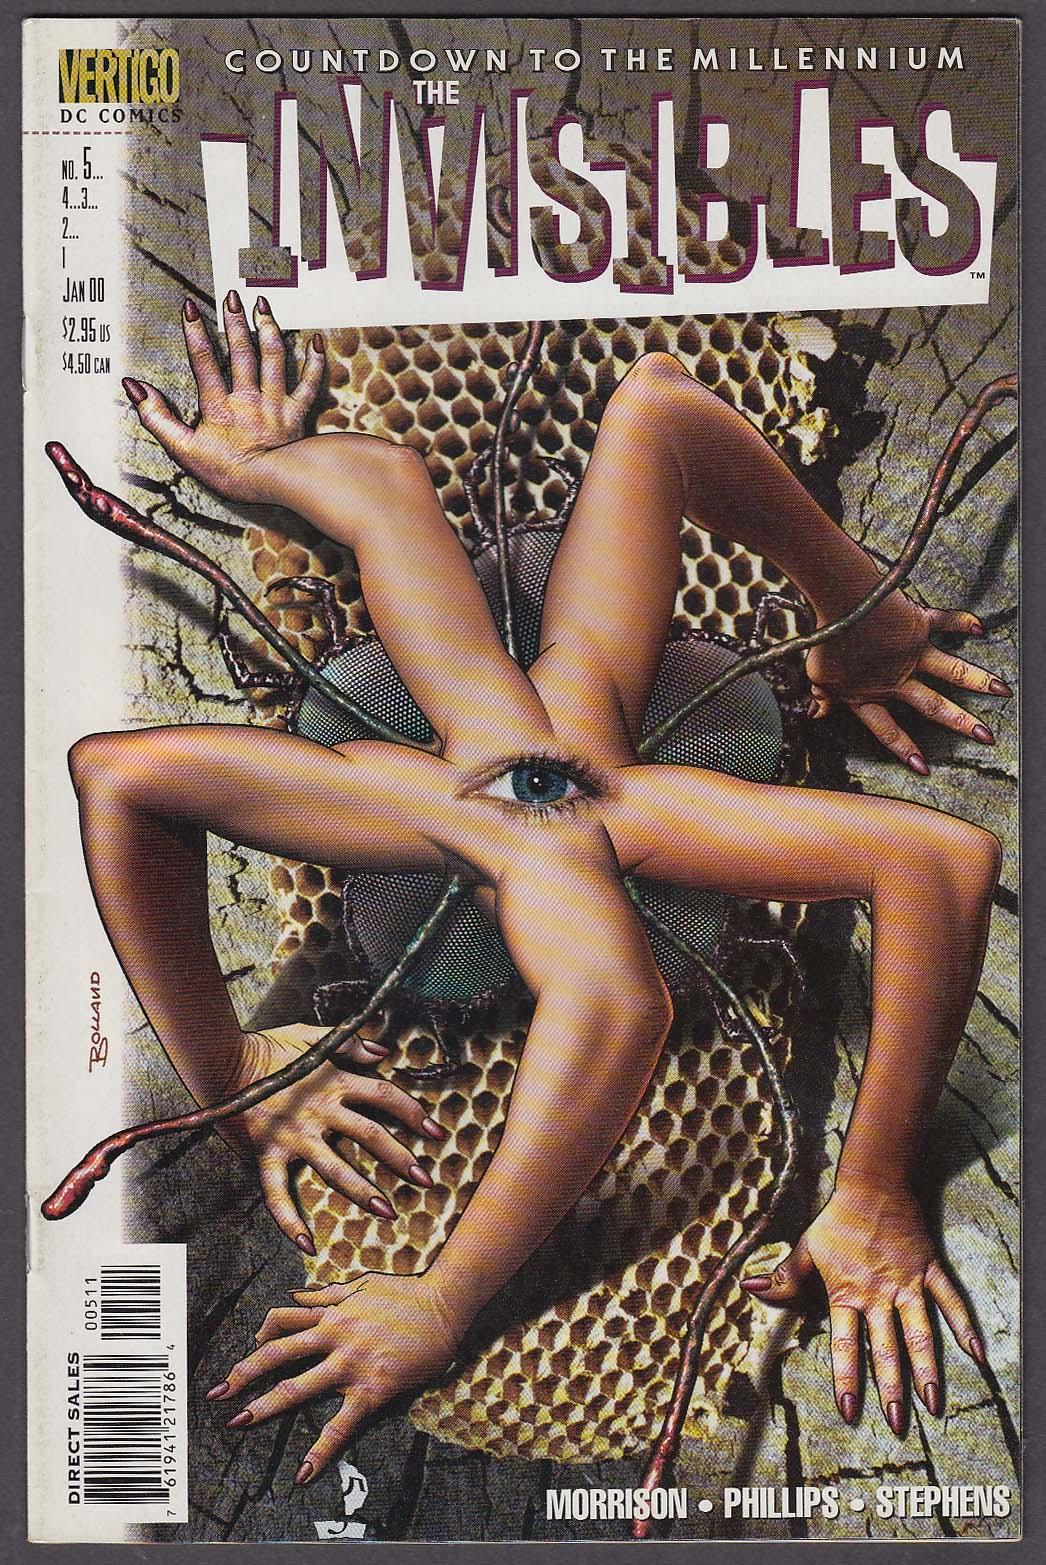 Image for The INVISIBLES #5 Vertigo comic book 1 2000